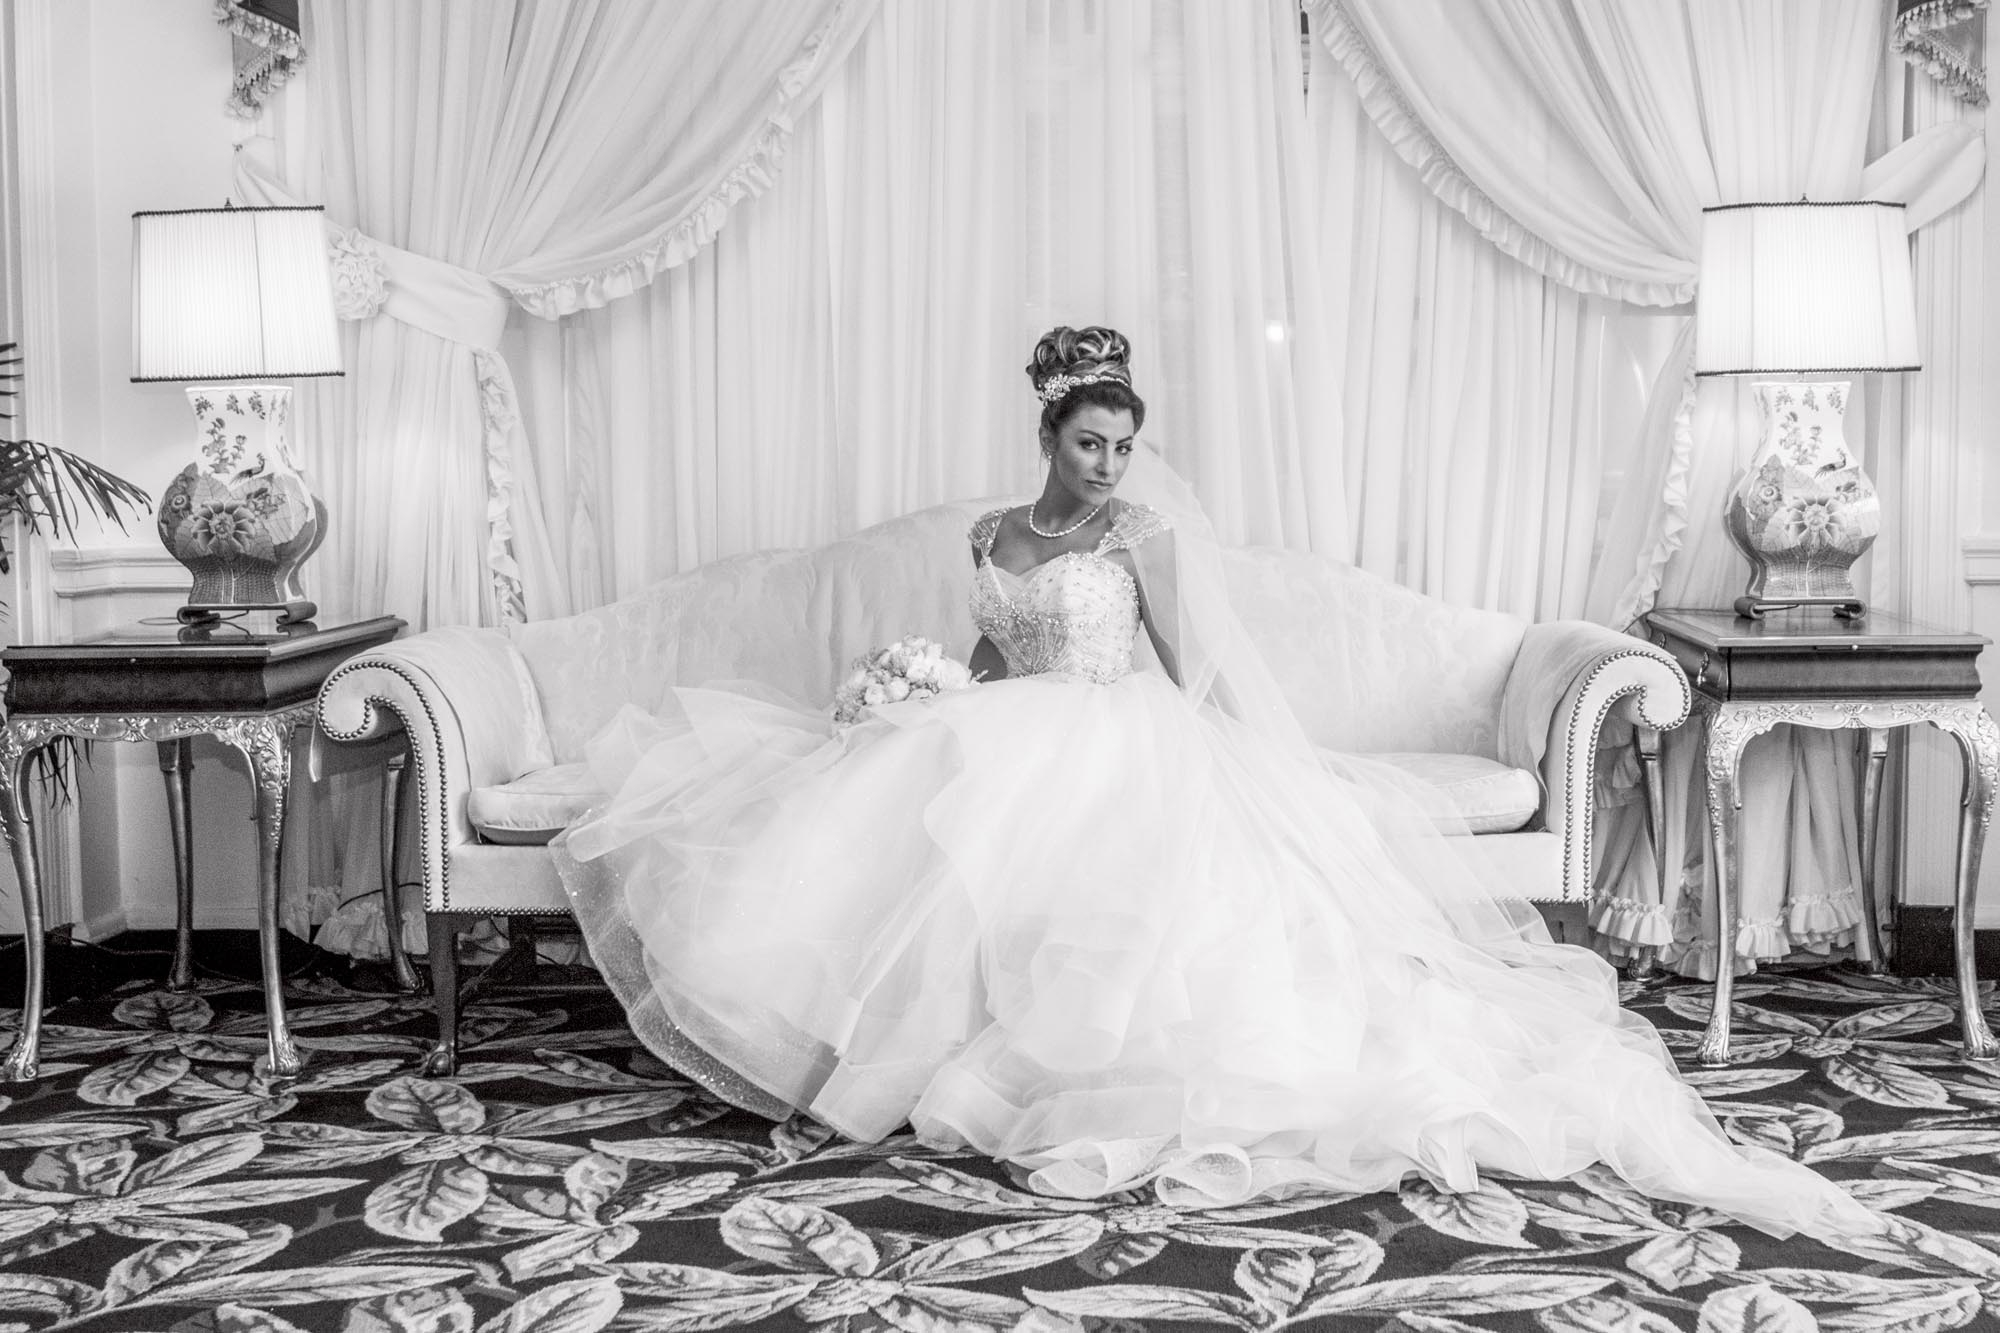 wv-wedding-photographer-sheena-pendley-8893-bw.jpg